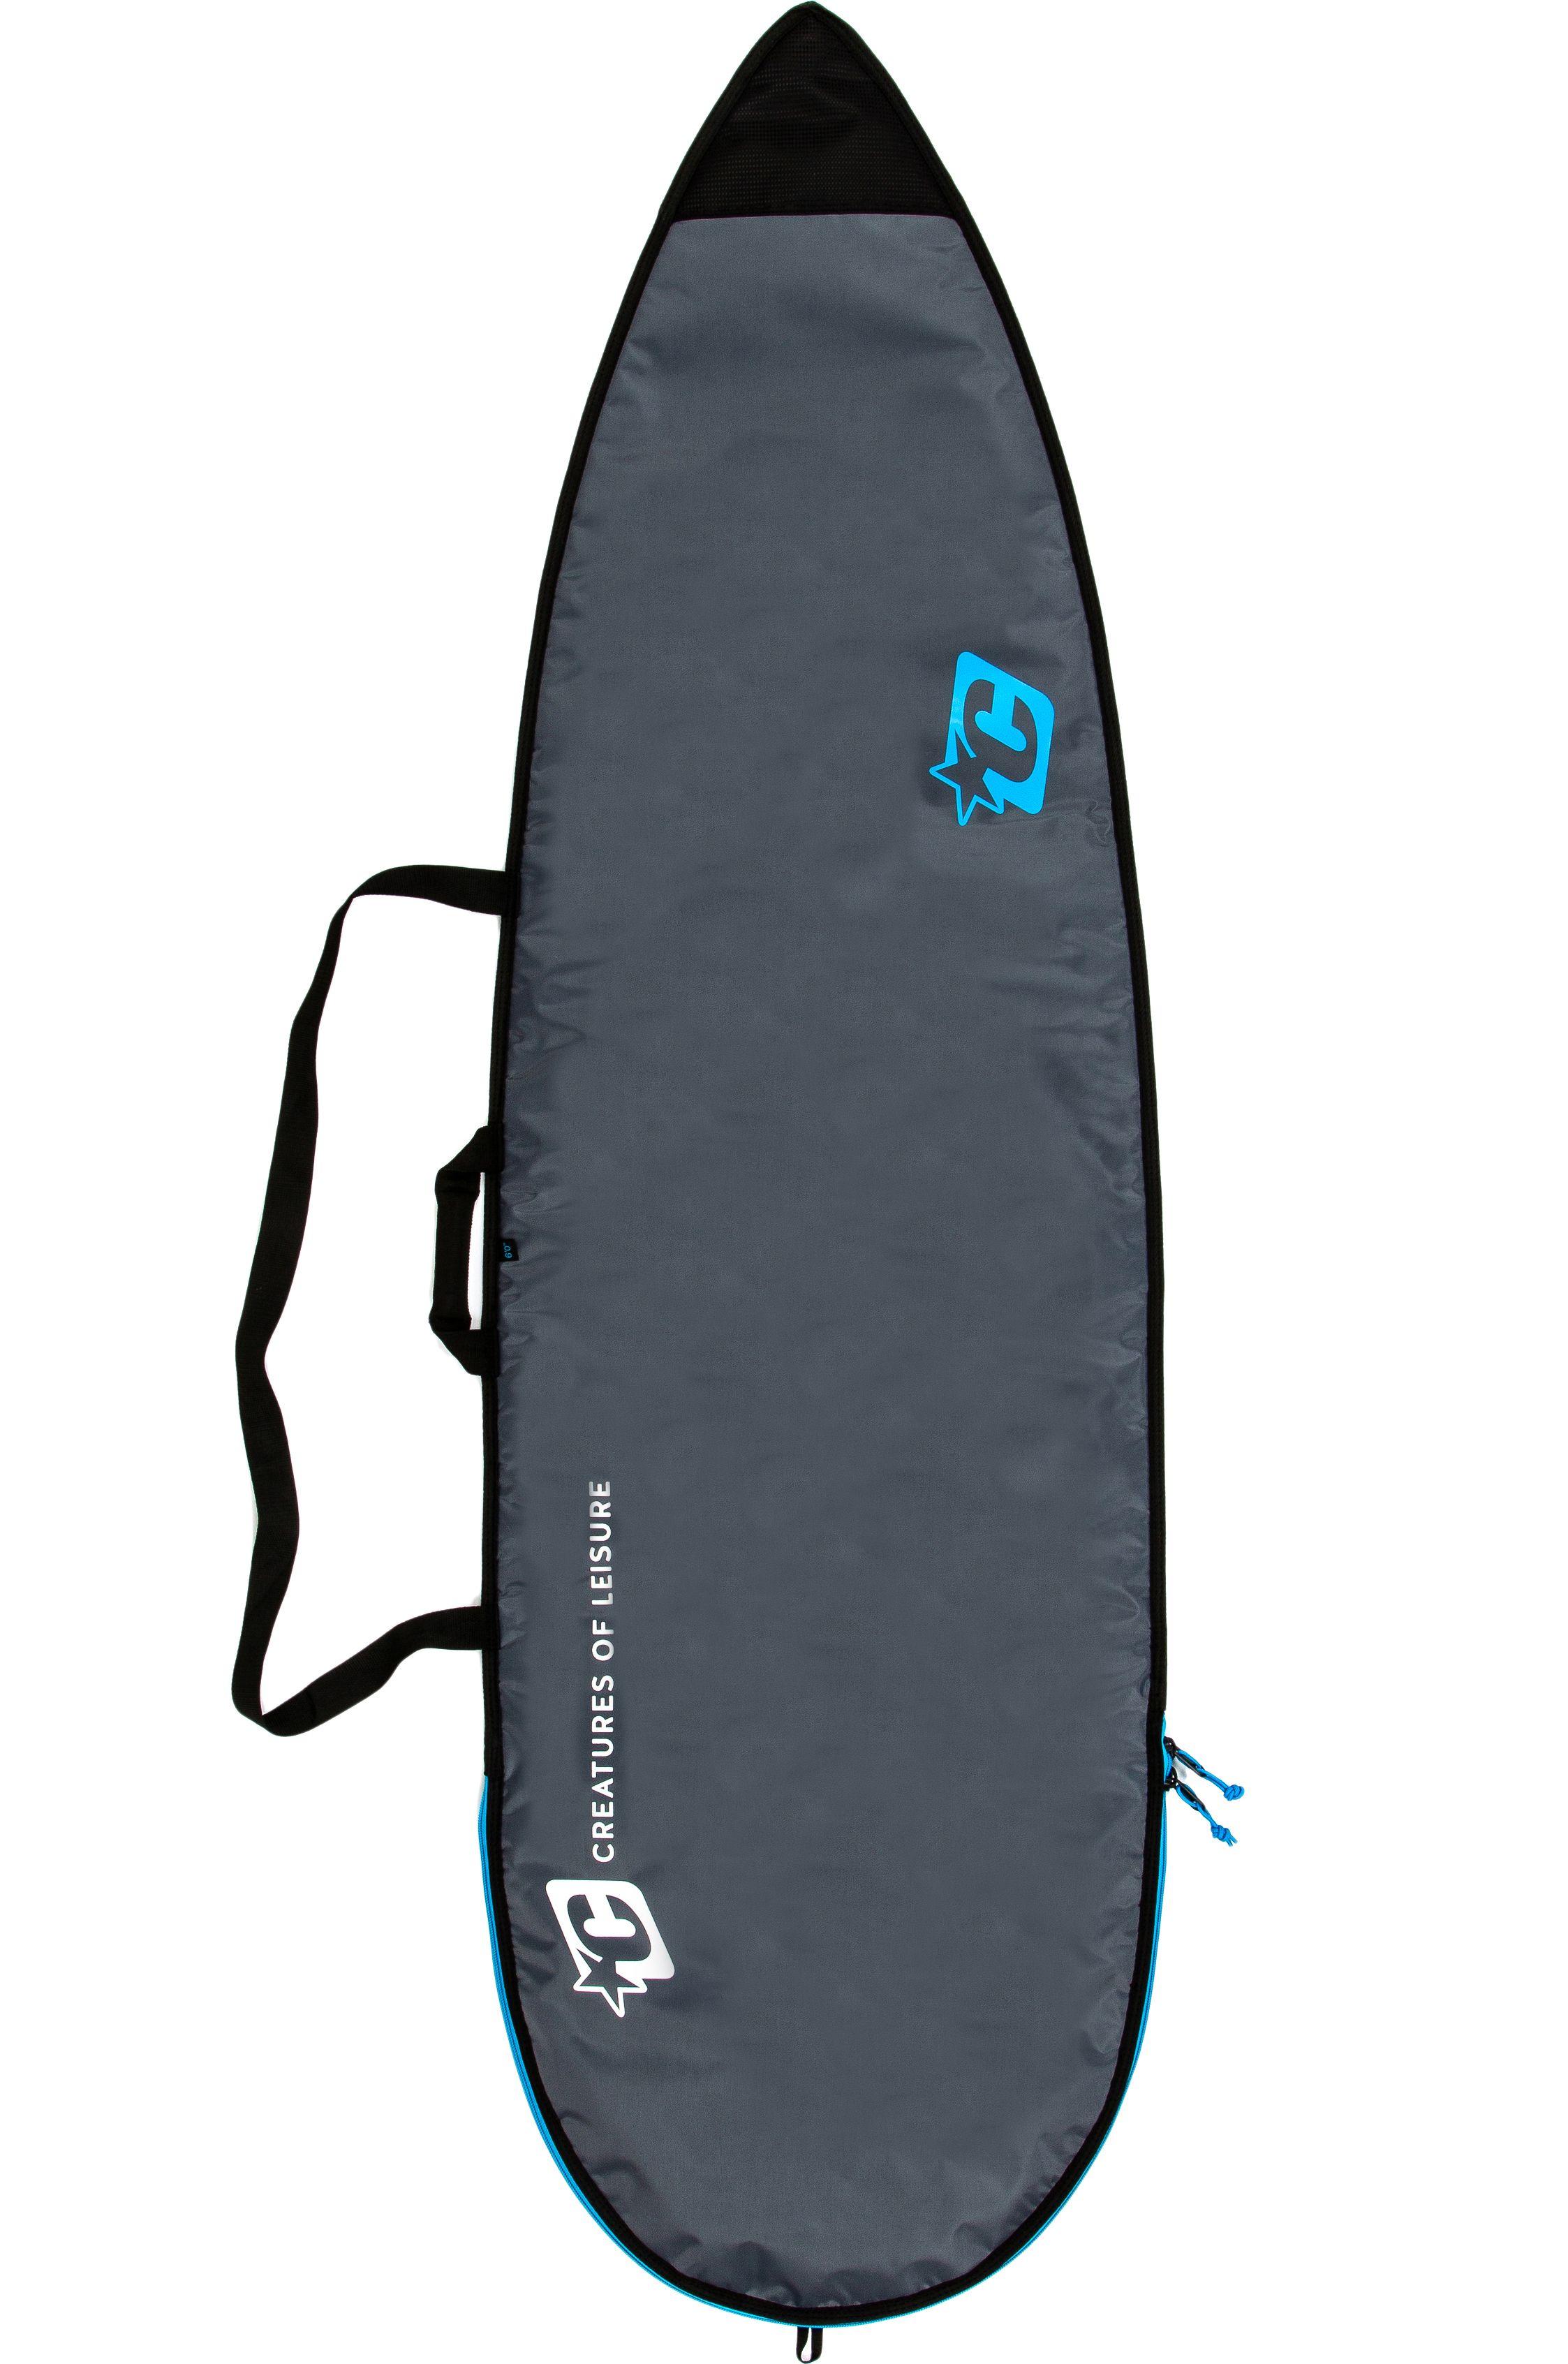 Creatures Boardbag 6'3 SHORTBOARD LITE Charcoal Cyan